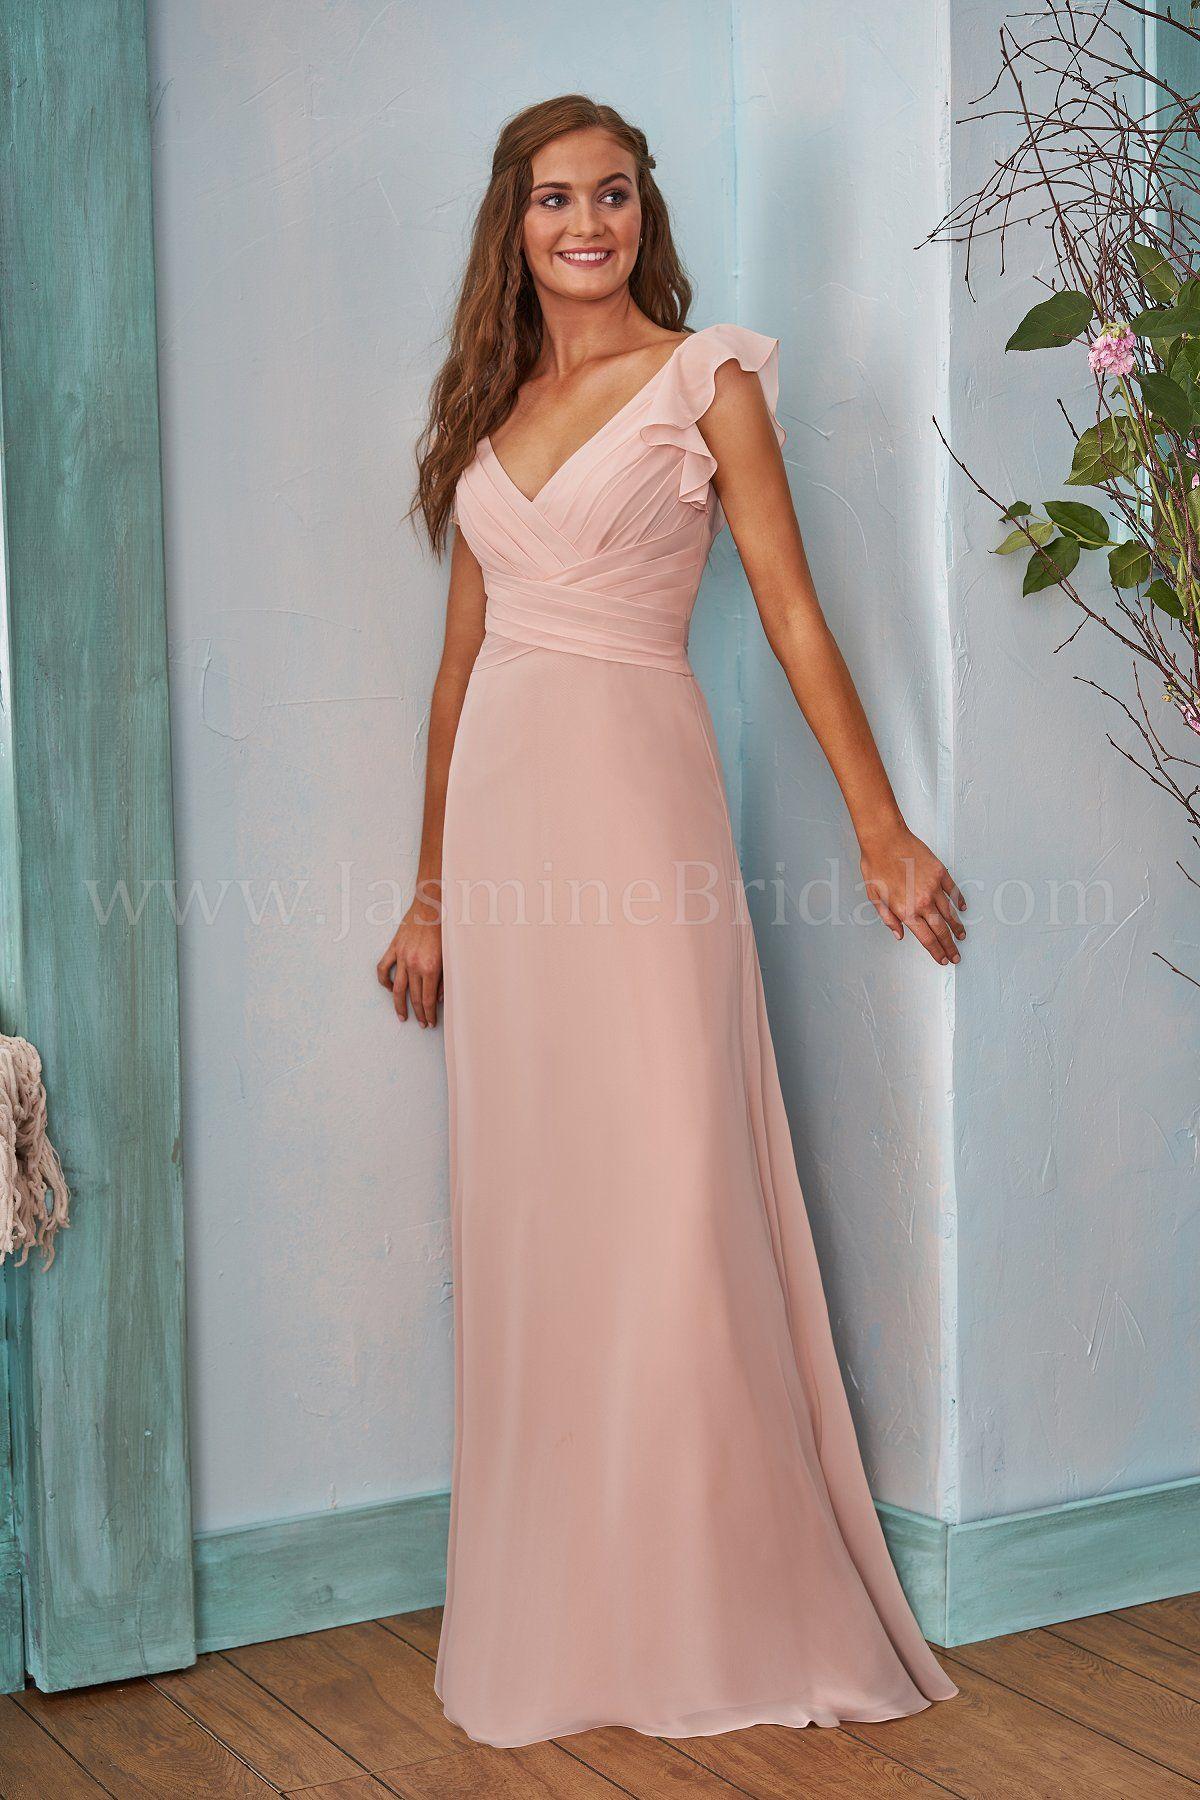 B203002 Long V-neck Poly Chiffon Bridesmaid Dress with Ruching | Box ...